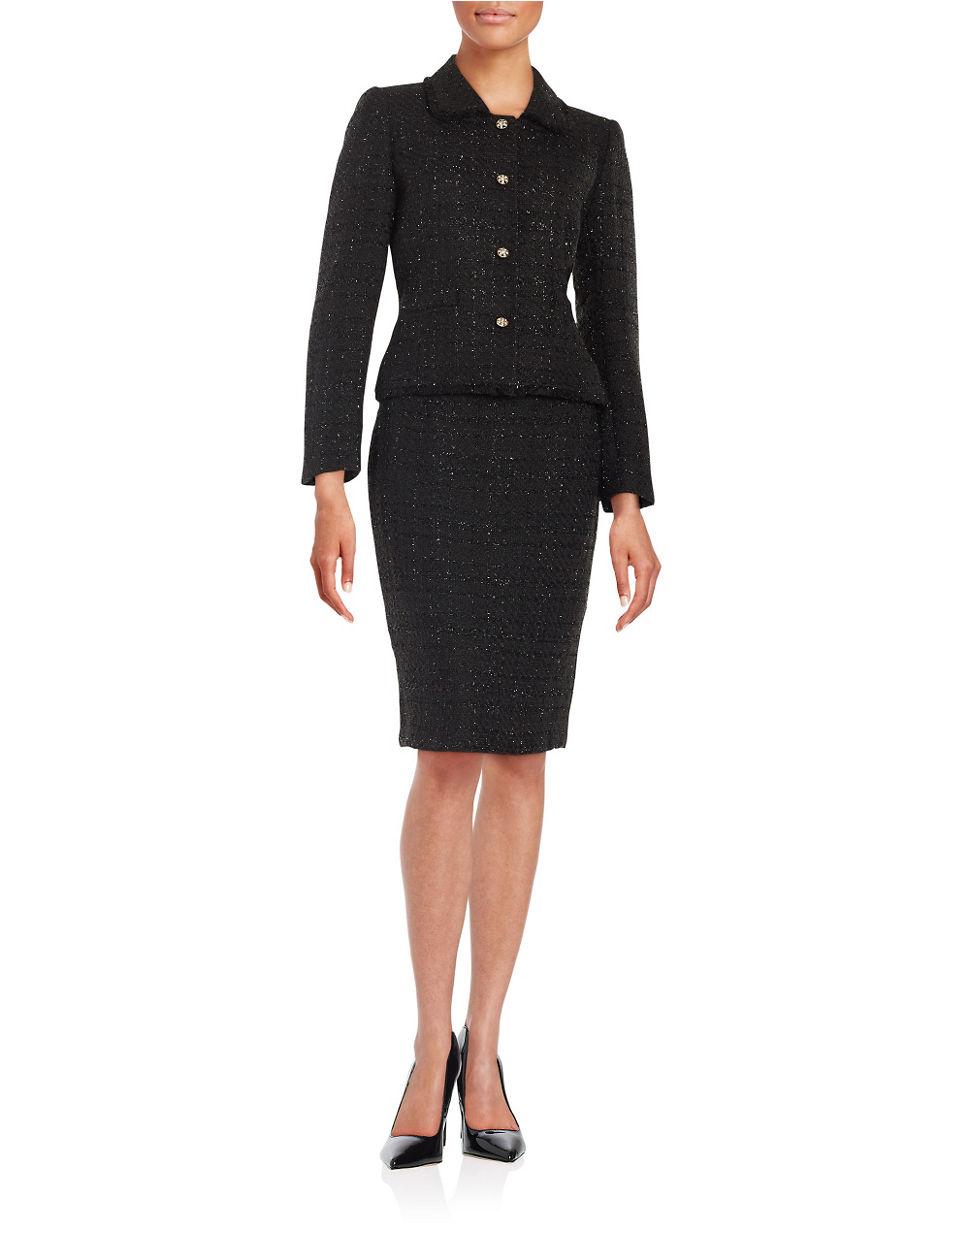 Lyst - Tahari Two-piece Metallic Tweed Jacket And Skirt ...